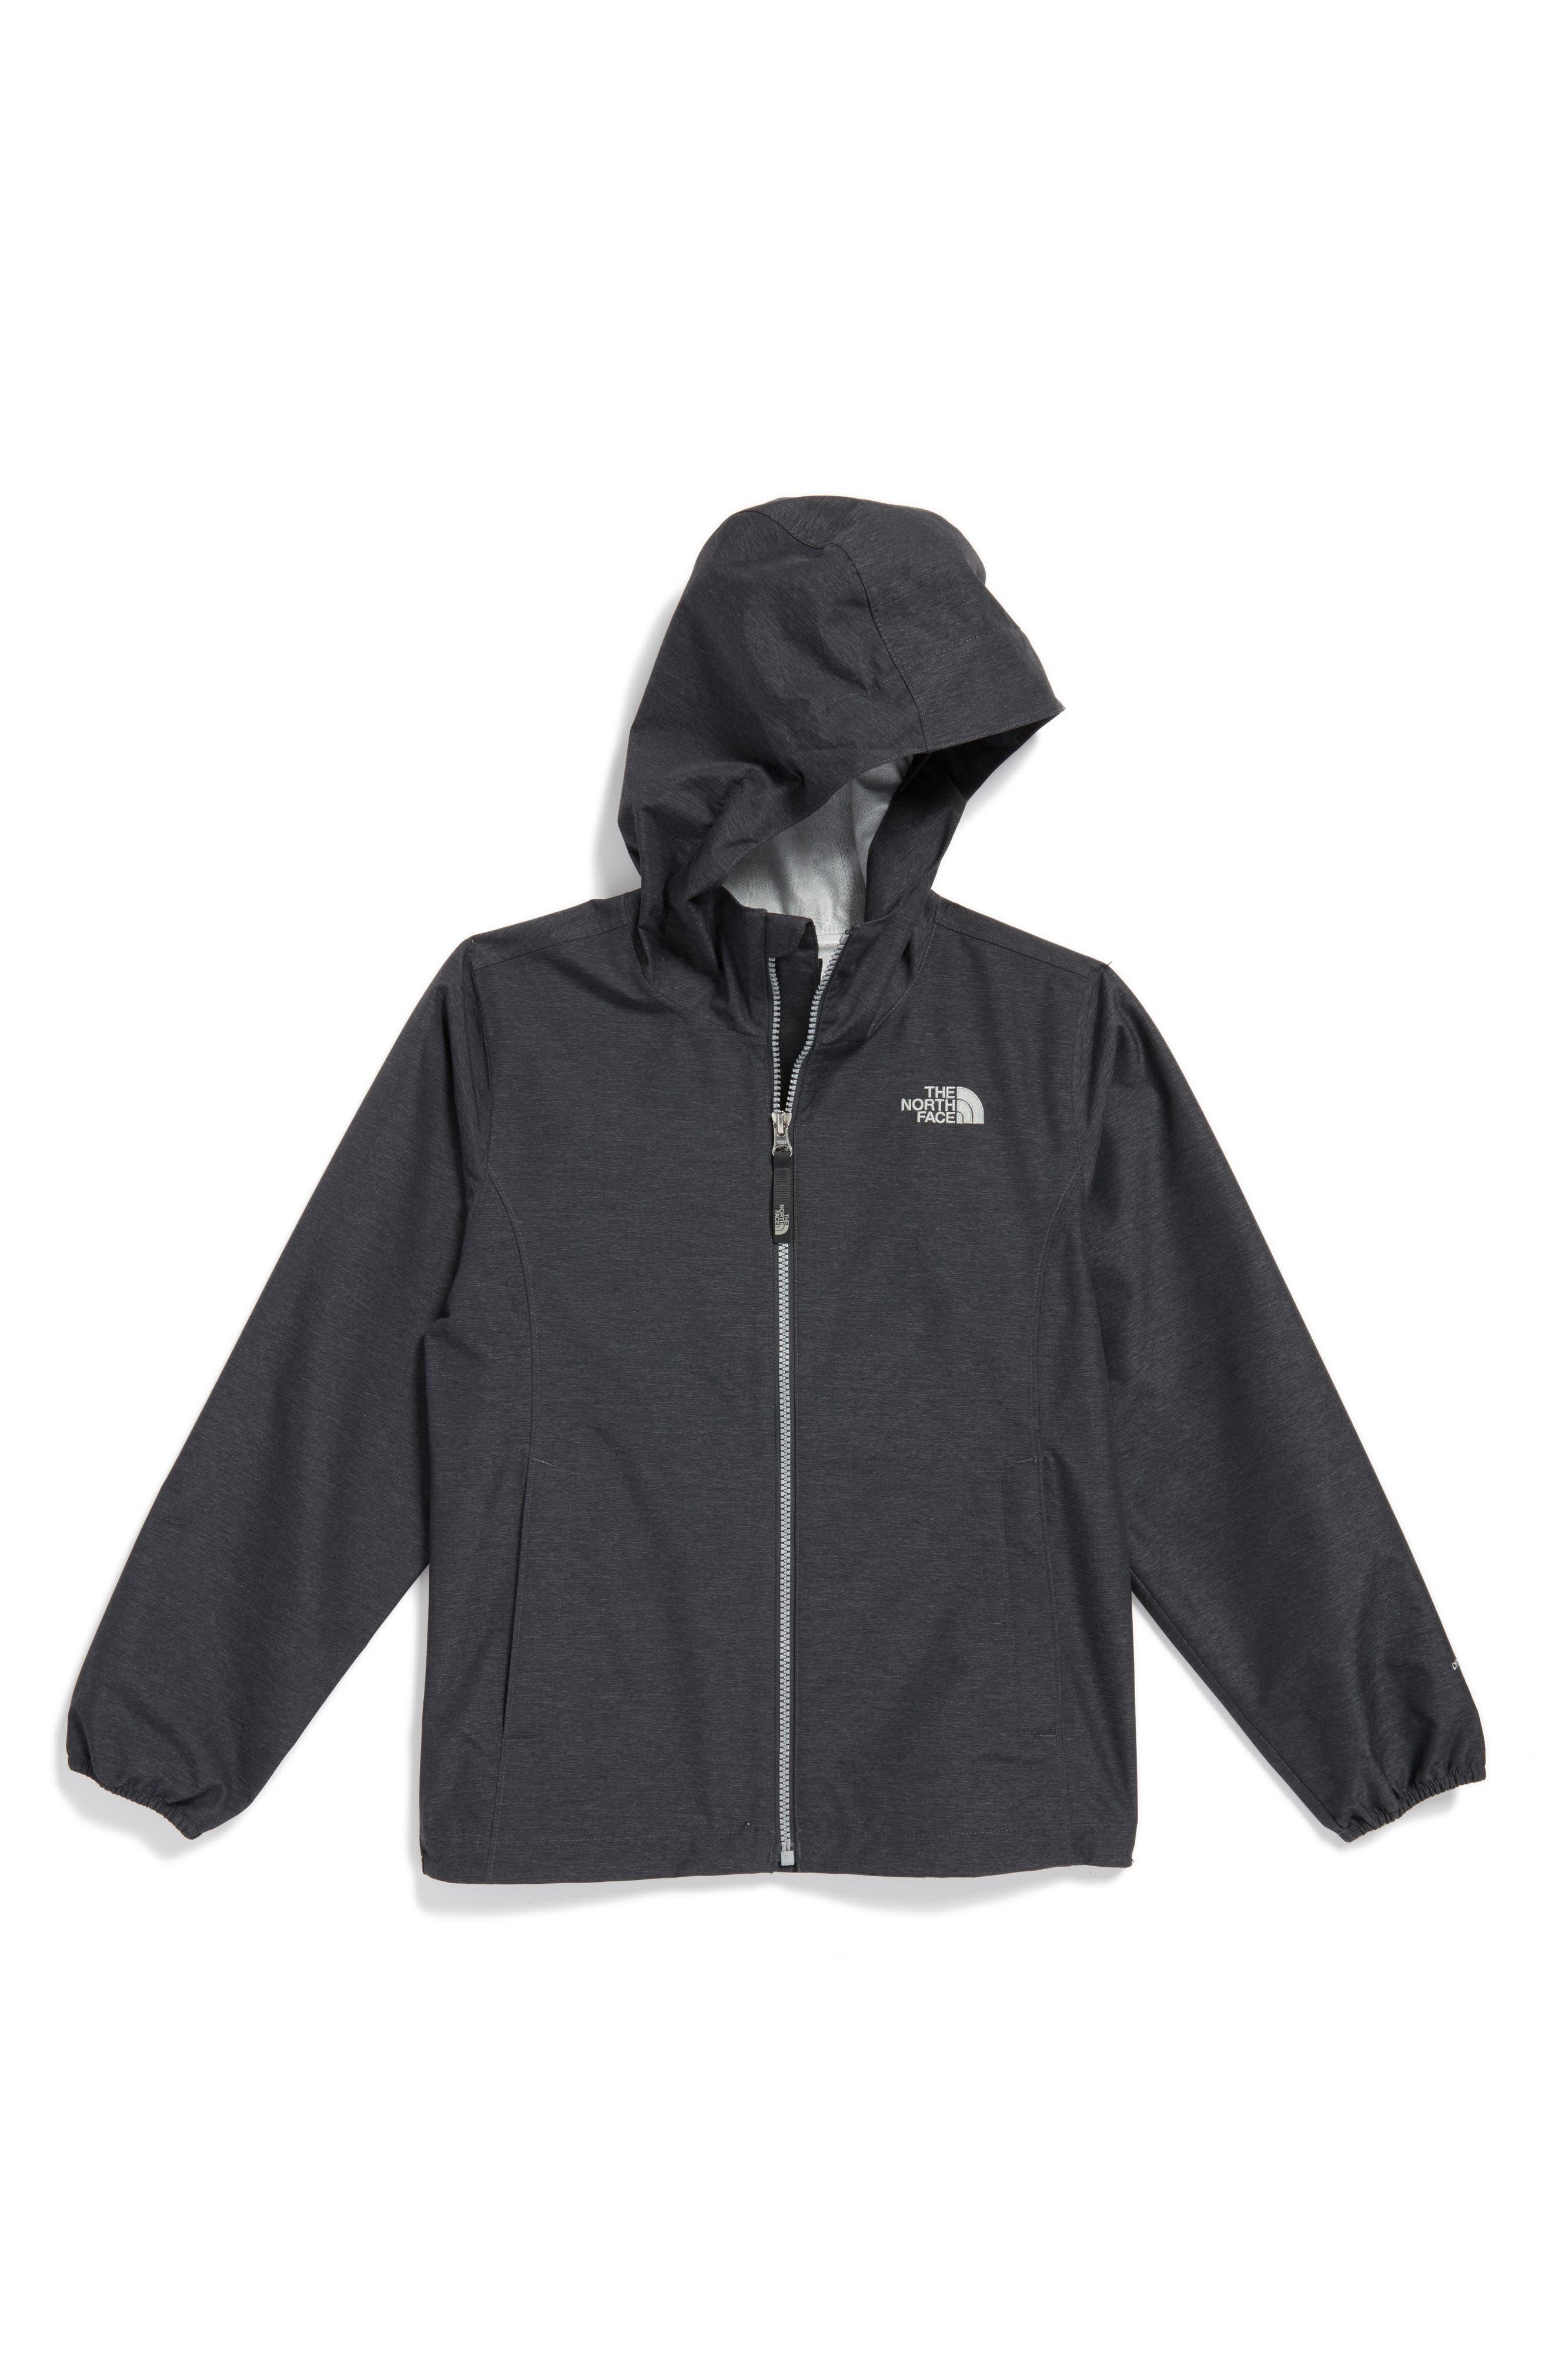 Magnolia Waterproof HyVent<sup>®</sup> Rain Jacket,                             Main thumbnail 1, color,                             021